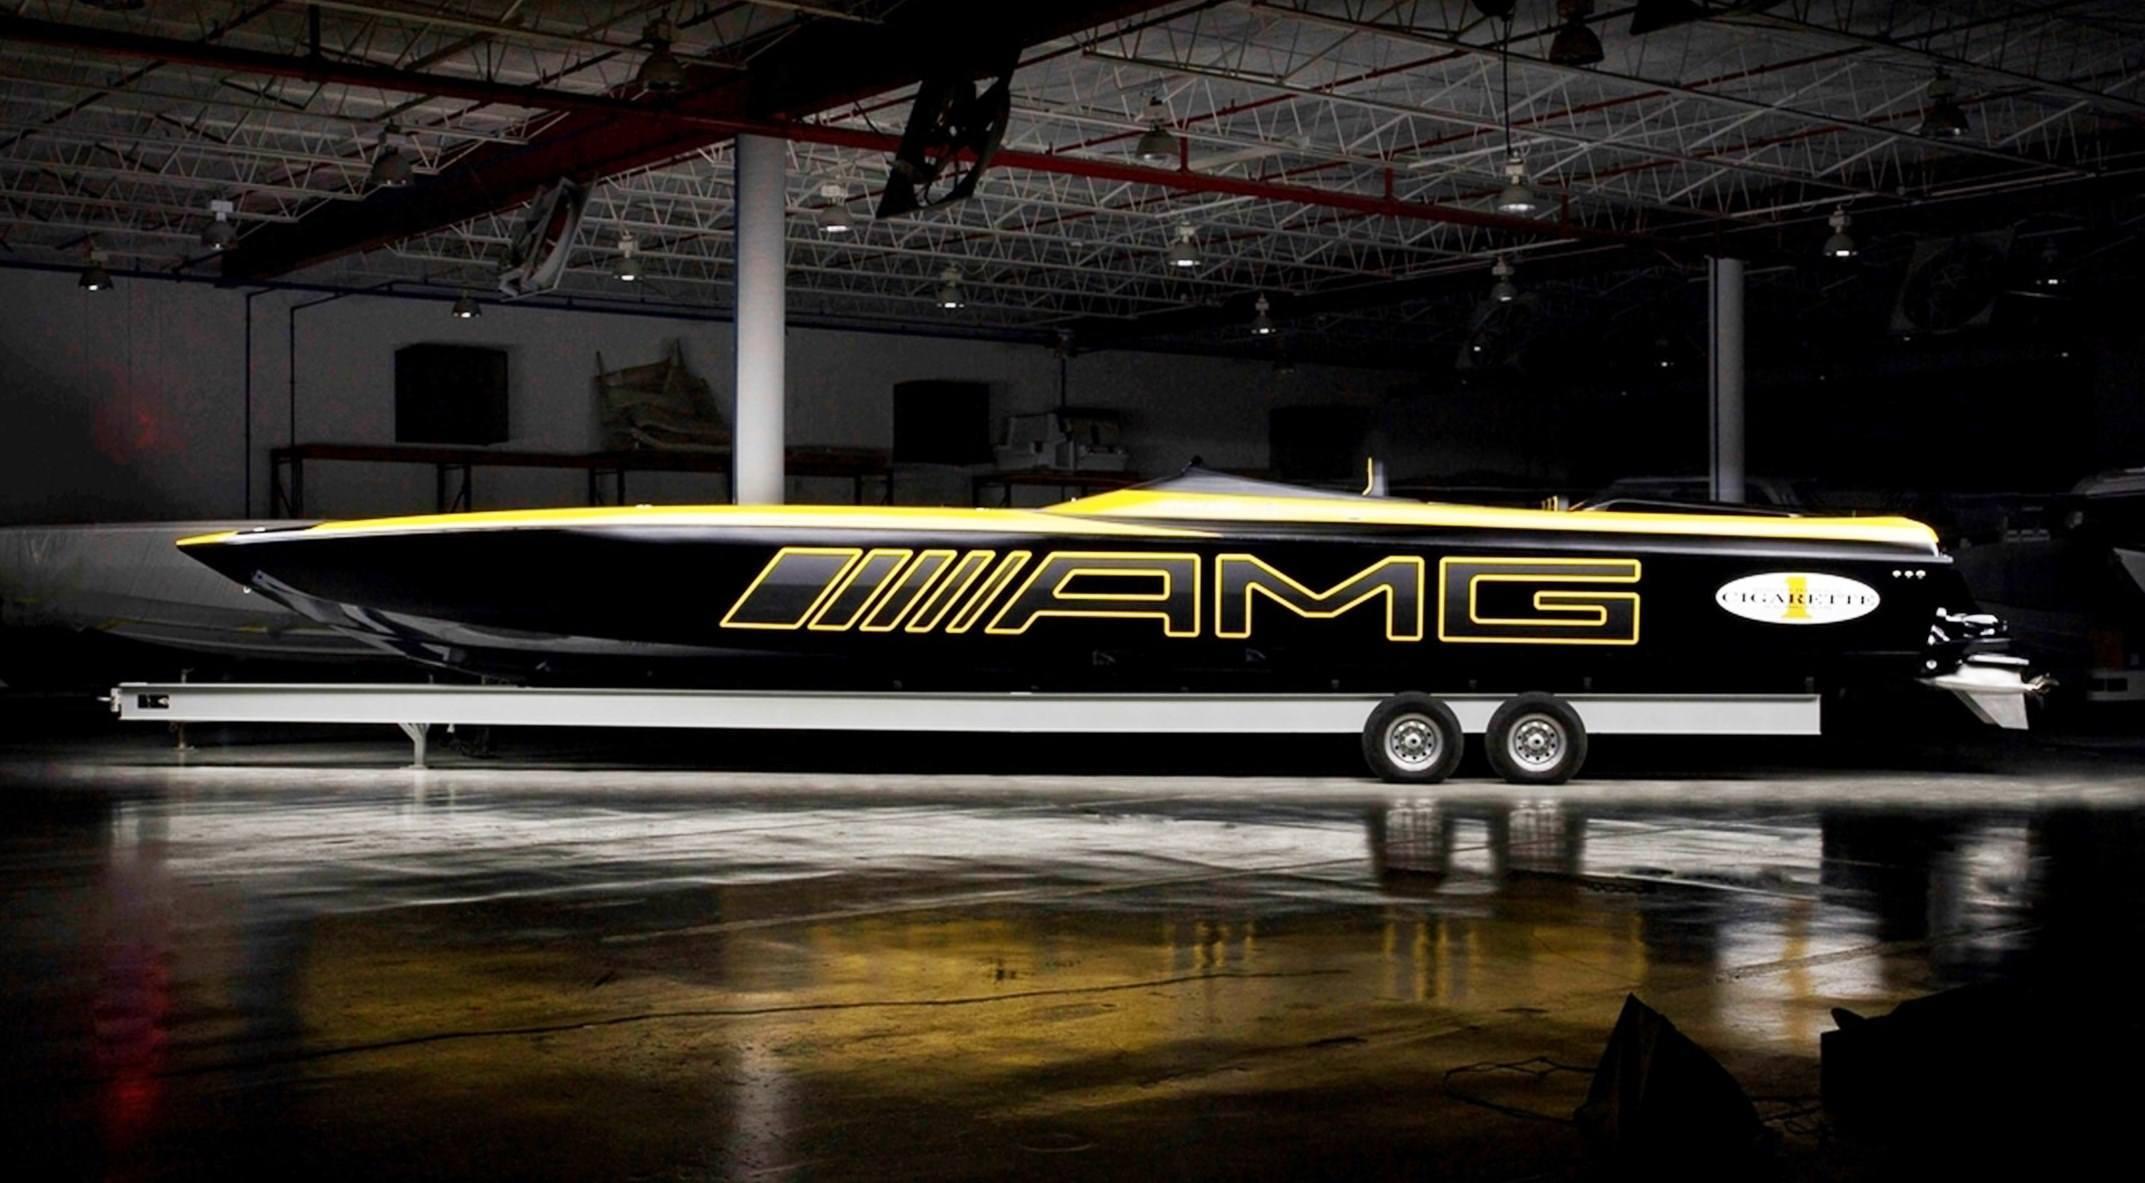 2015 MercedesAMG GT S Cigarette Boat